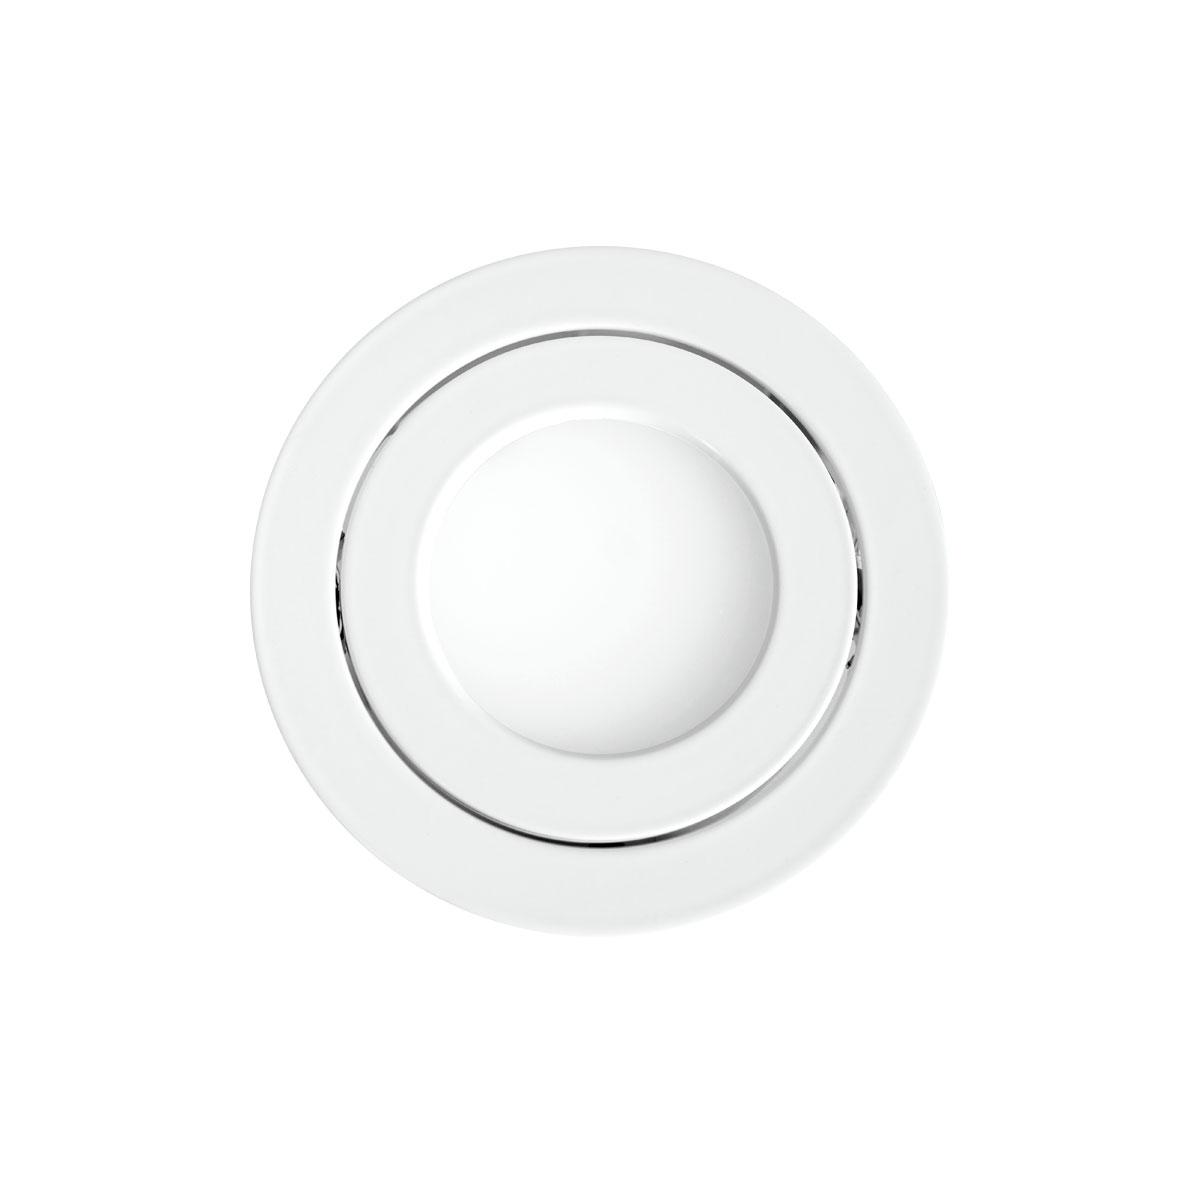 Aircom micro orientable luminaria empotrable secom - Sistemas de iluminacion interior ...